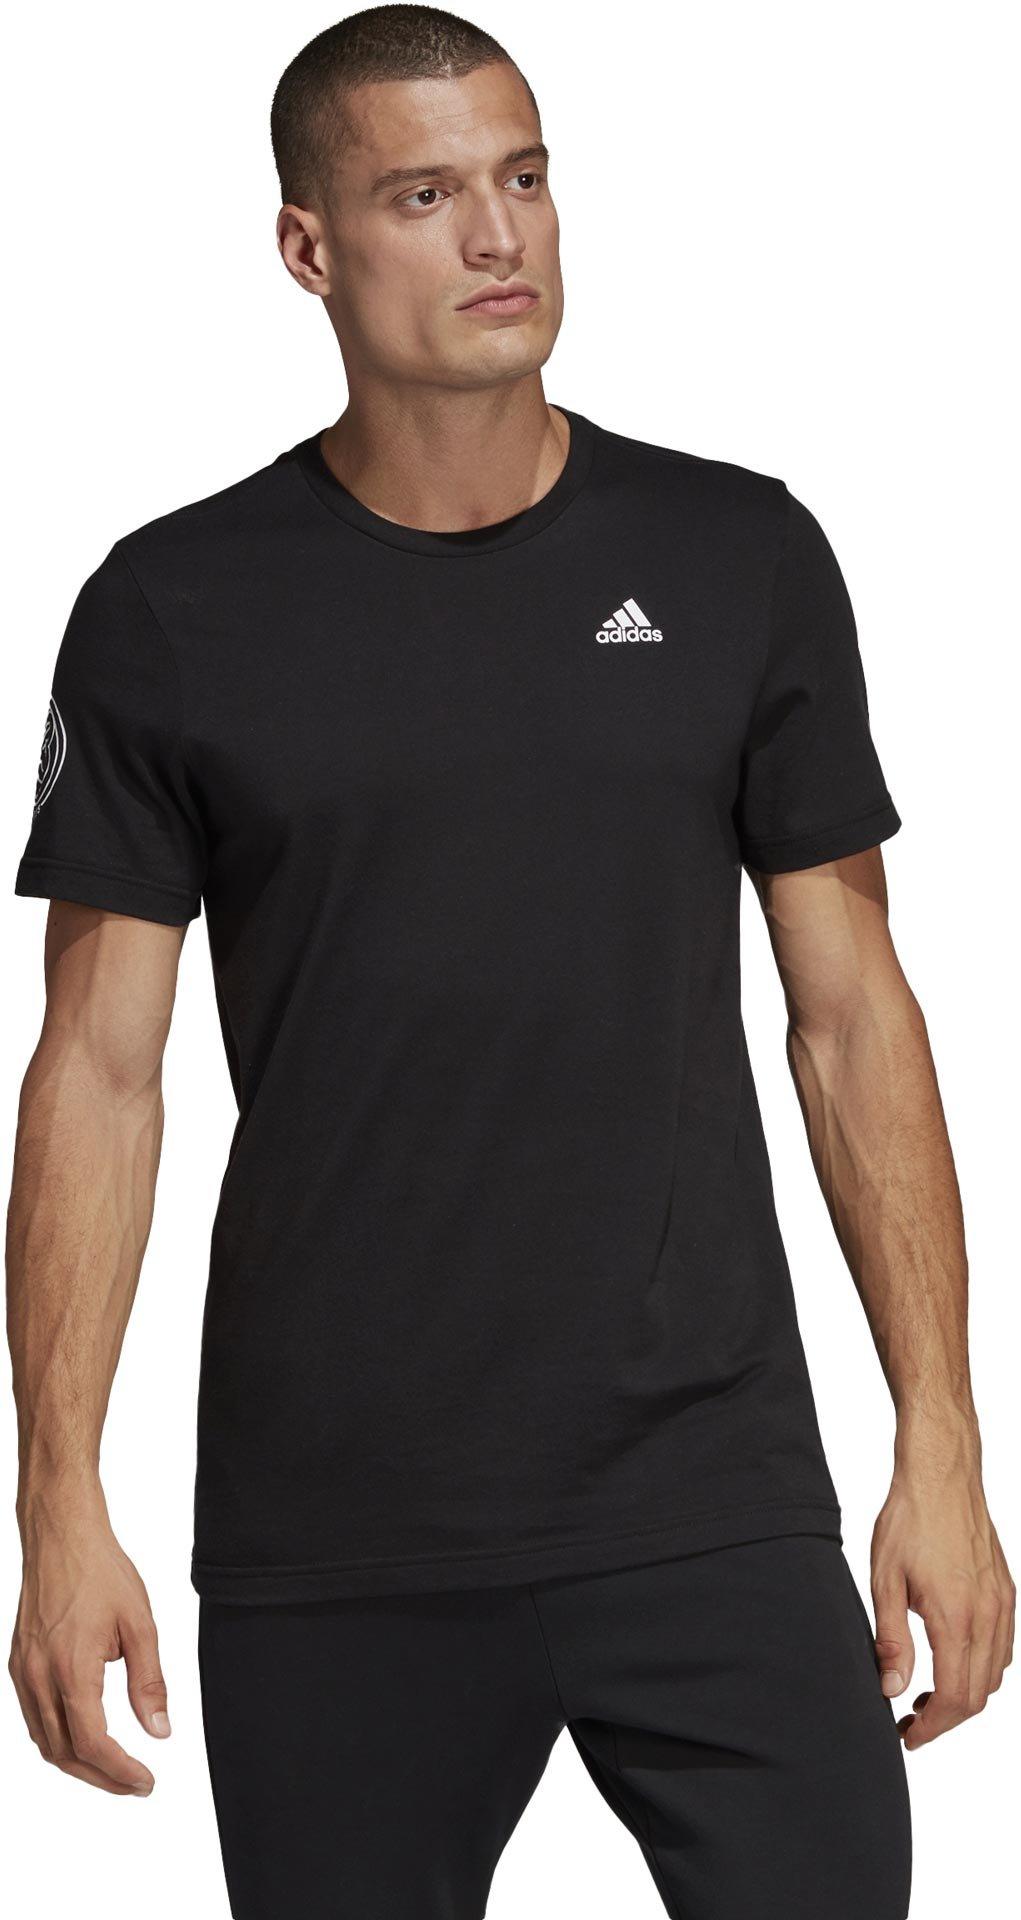 adidas Šport ID 360 Adi Tee XS